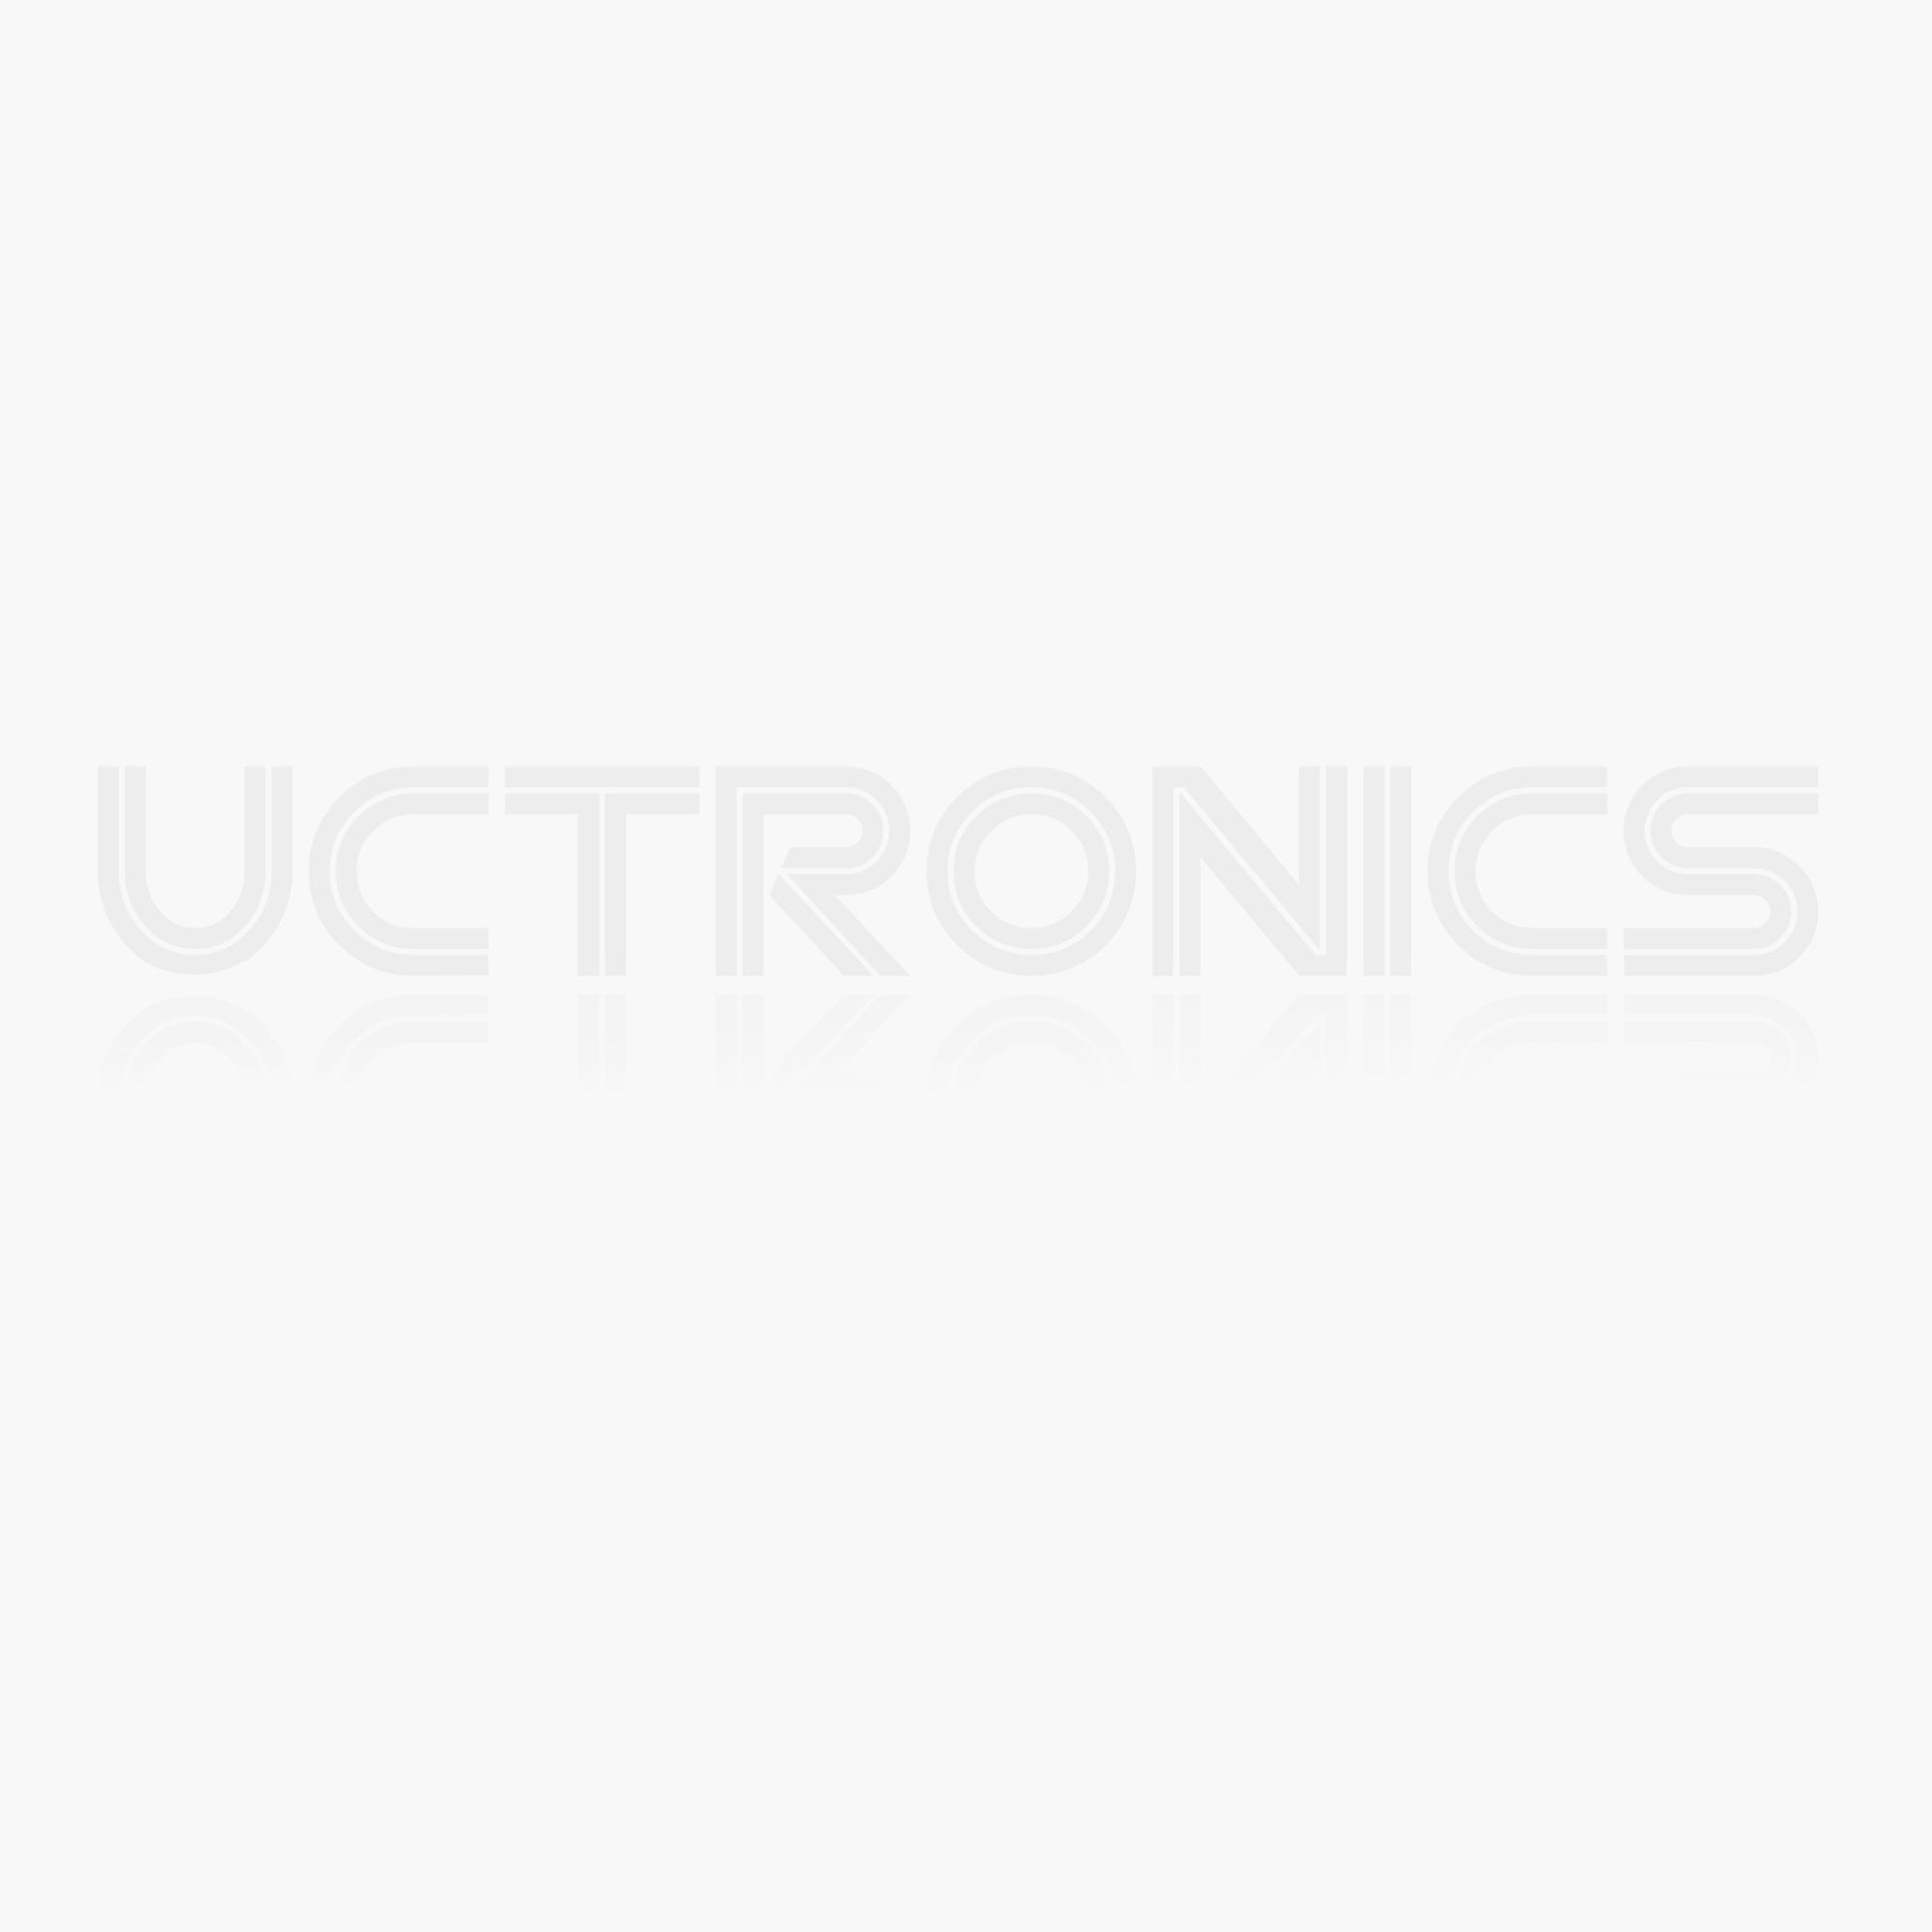 SYB-170 Mini Breadboard Solderless Prototype 170 Tie-points Clear Transparent